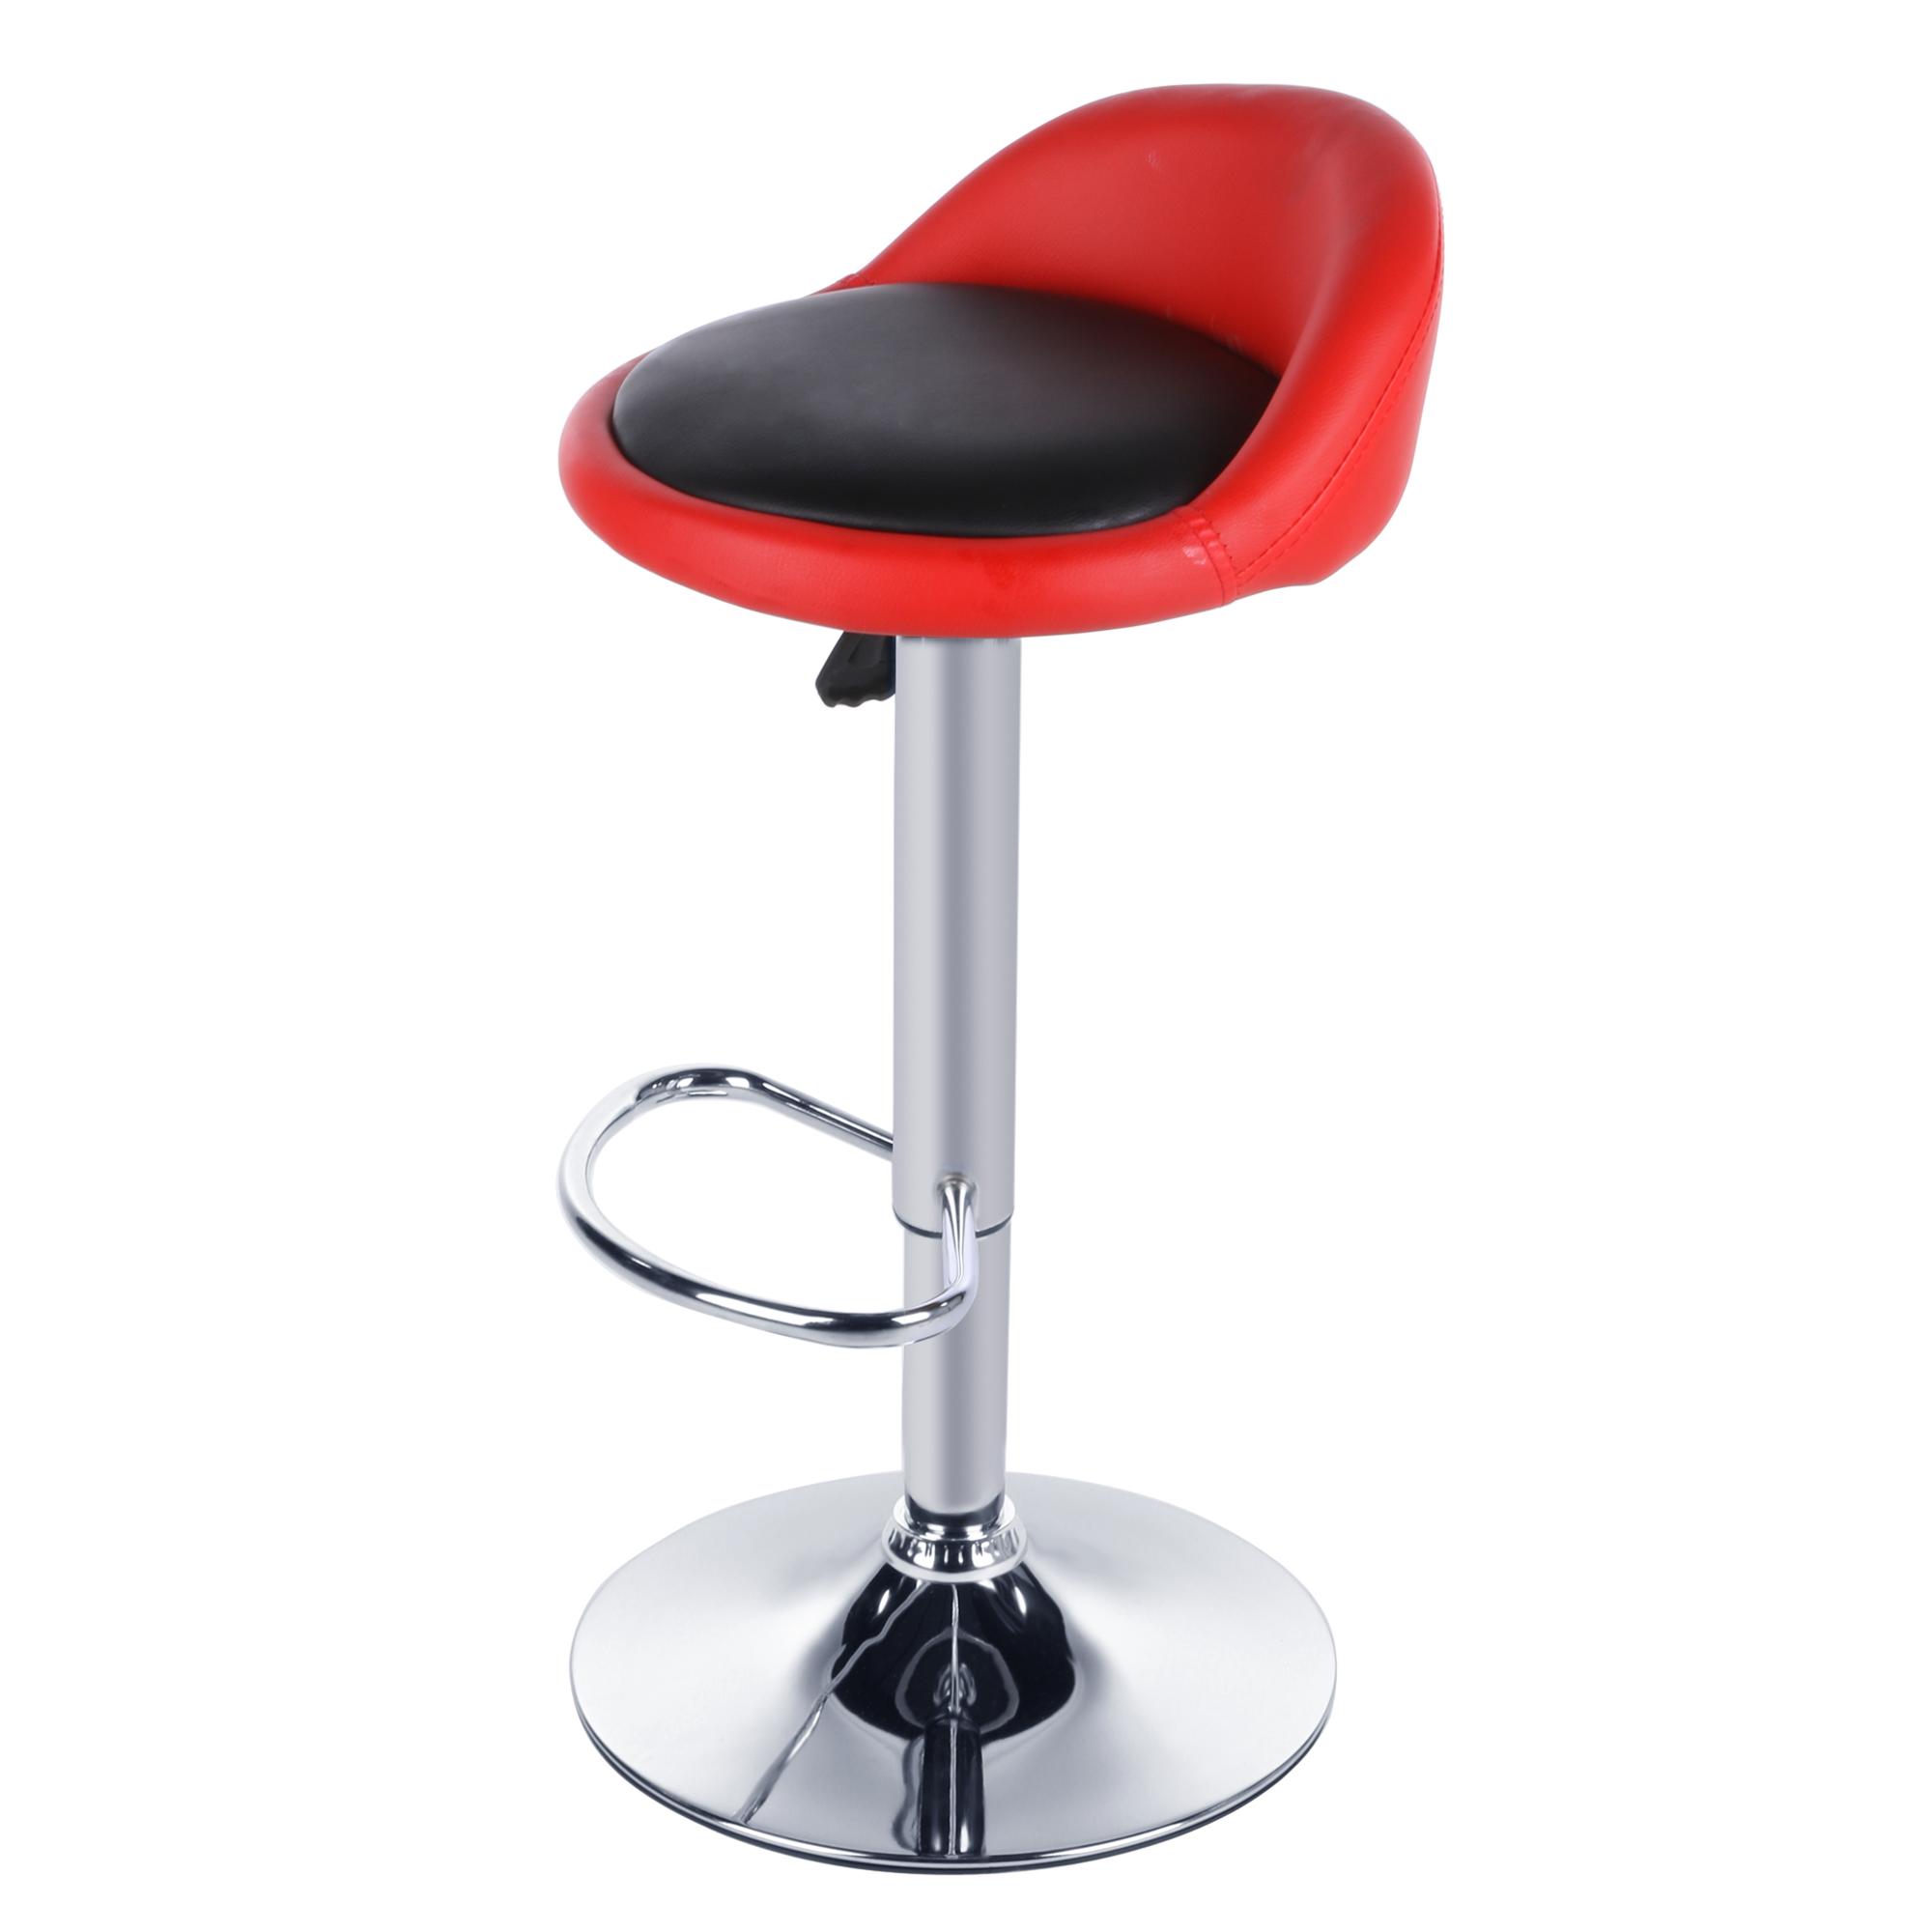 revolving chair bar stool blue arm aliexpress buy homdox 2pcs synthetic leather